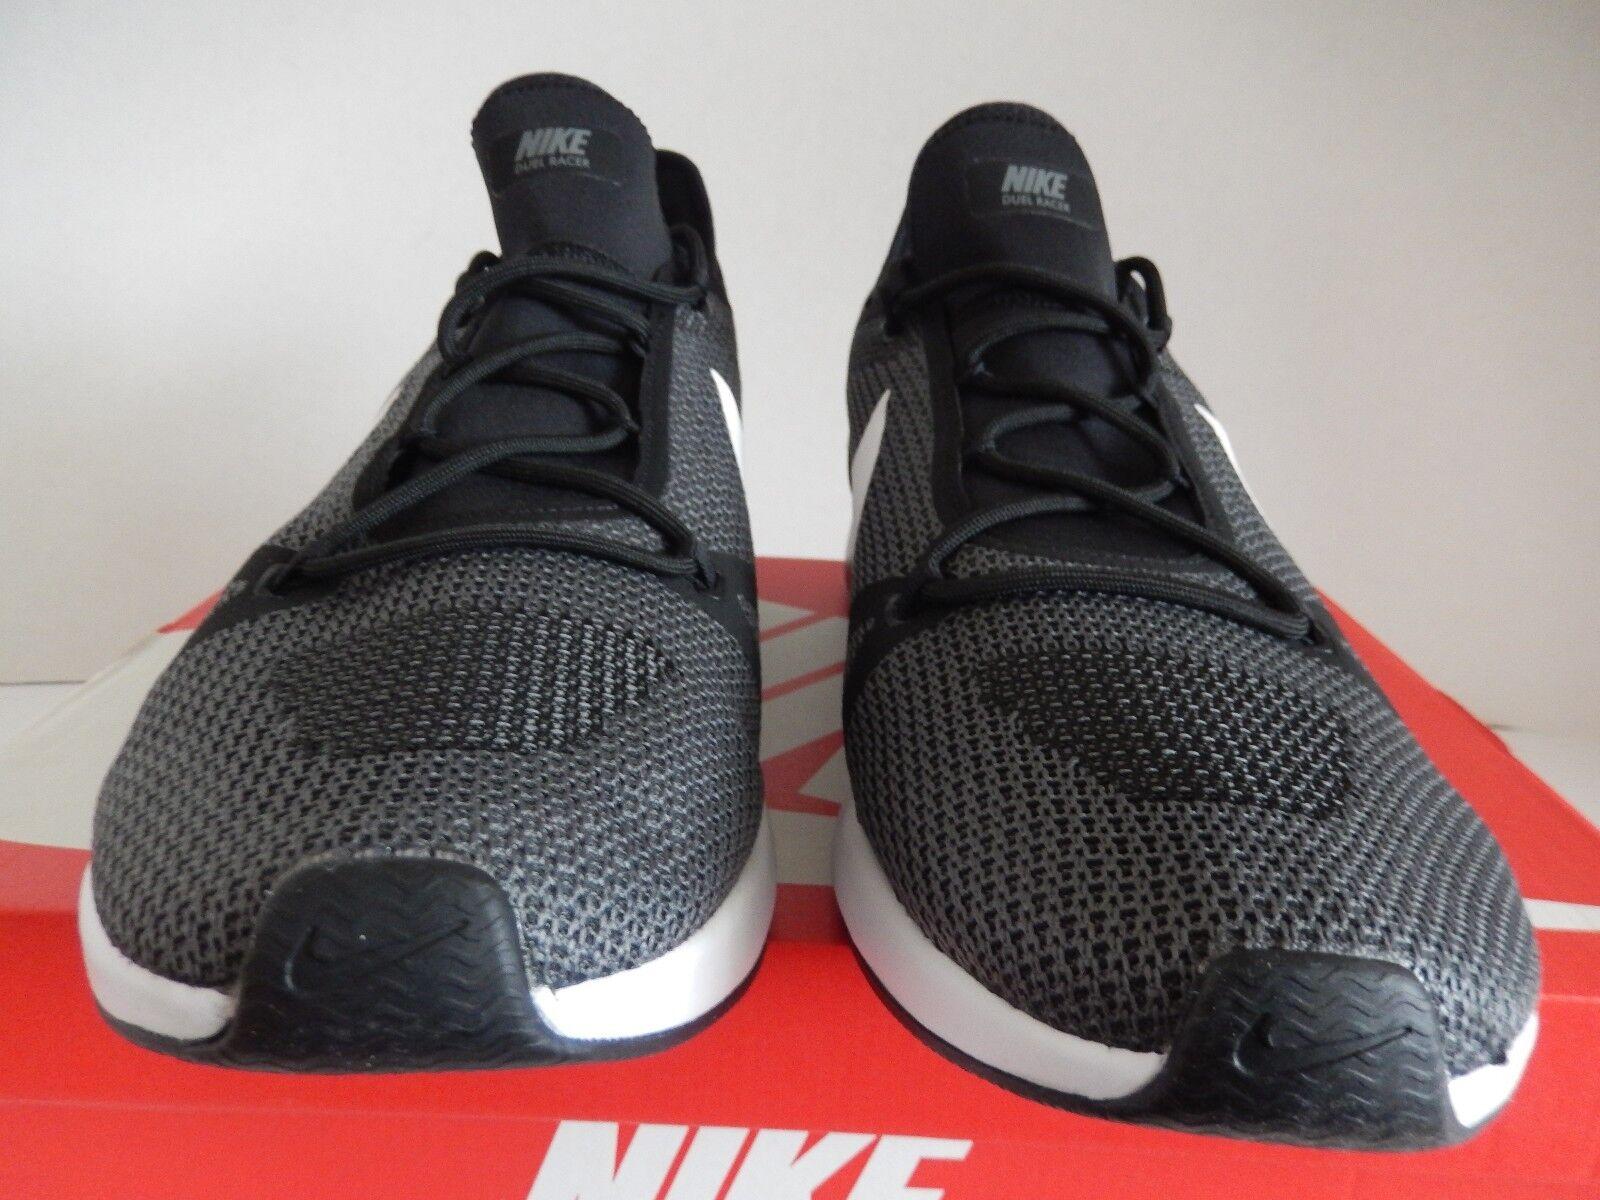 Nike schwarz-Weiß-dark duell racer schwarz-Weiß-dark Nike Grau-Weiß sz 15 [918228-010] 0f7800